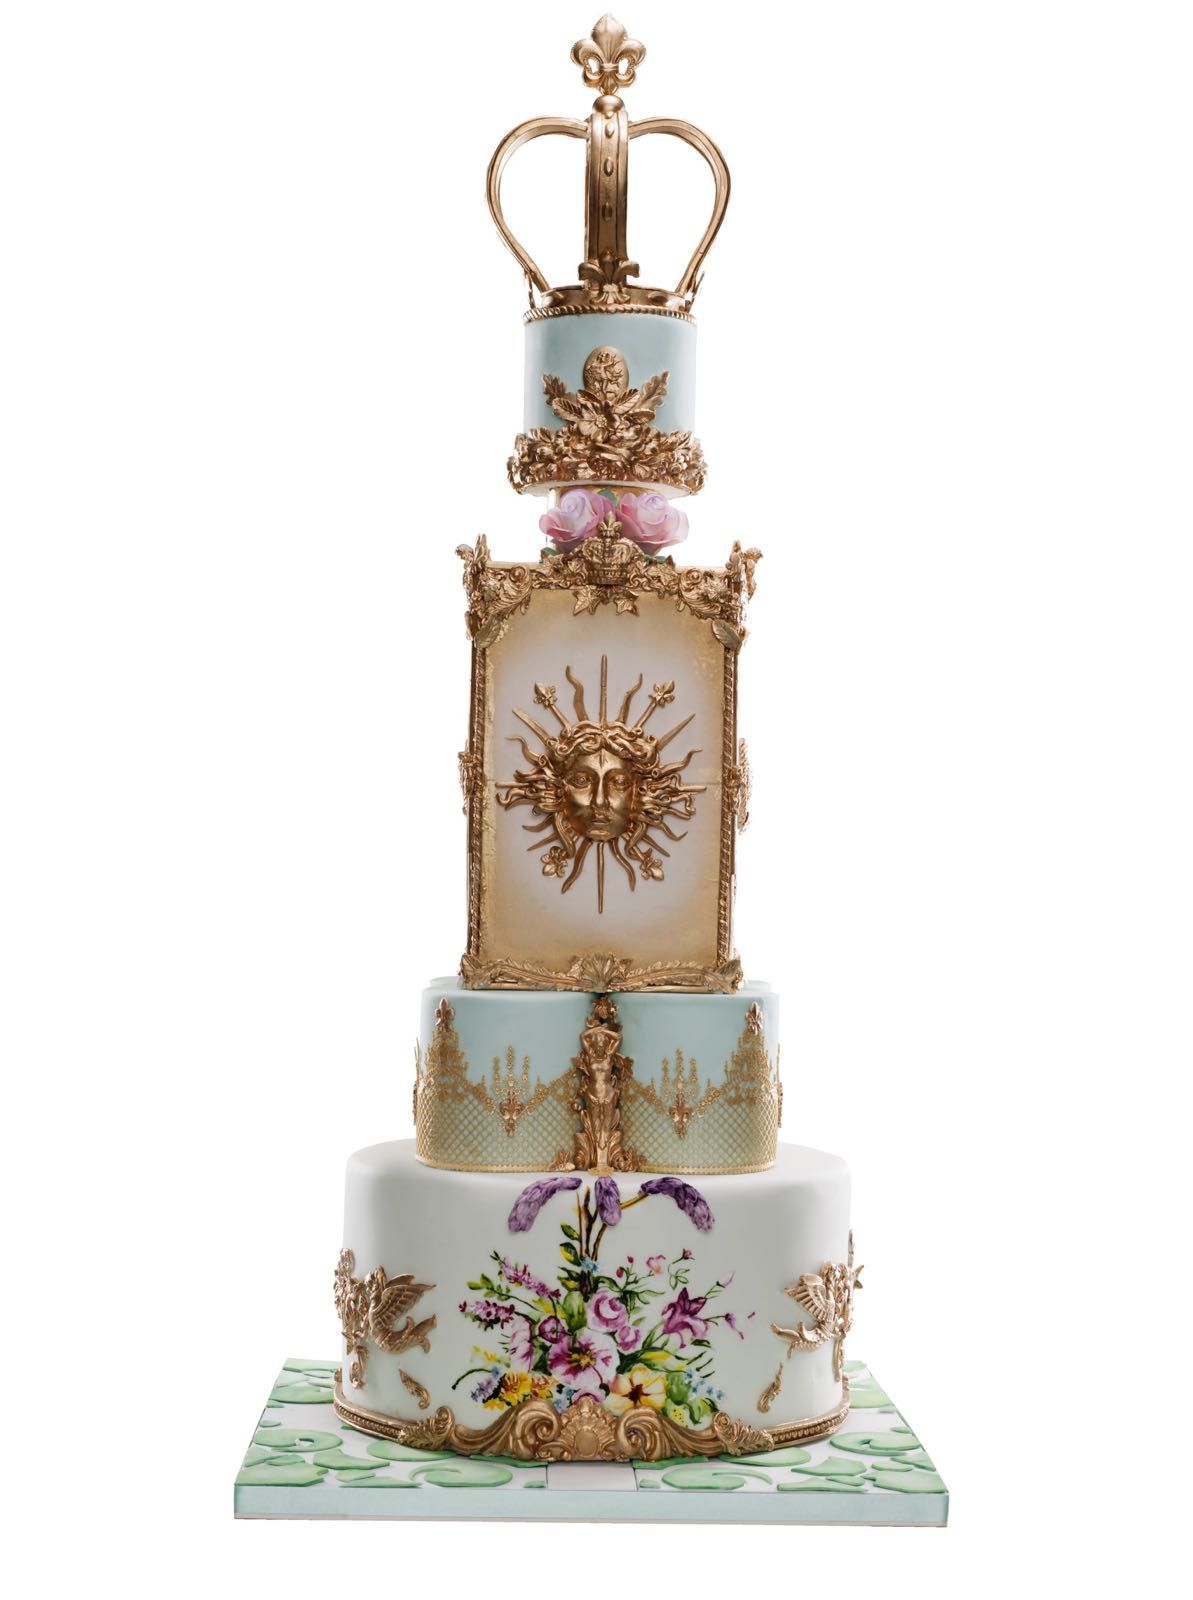 Versailles Cake My Vision Of Royal Wedding Cake Silver Medal Sugar